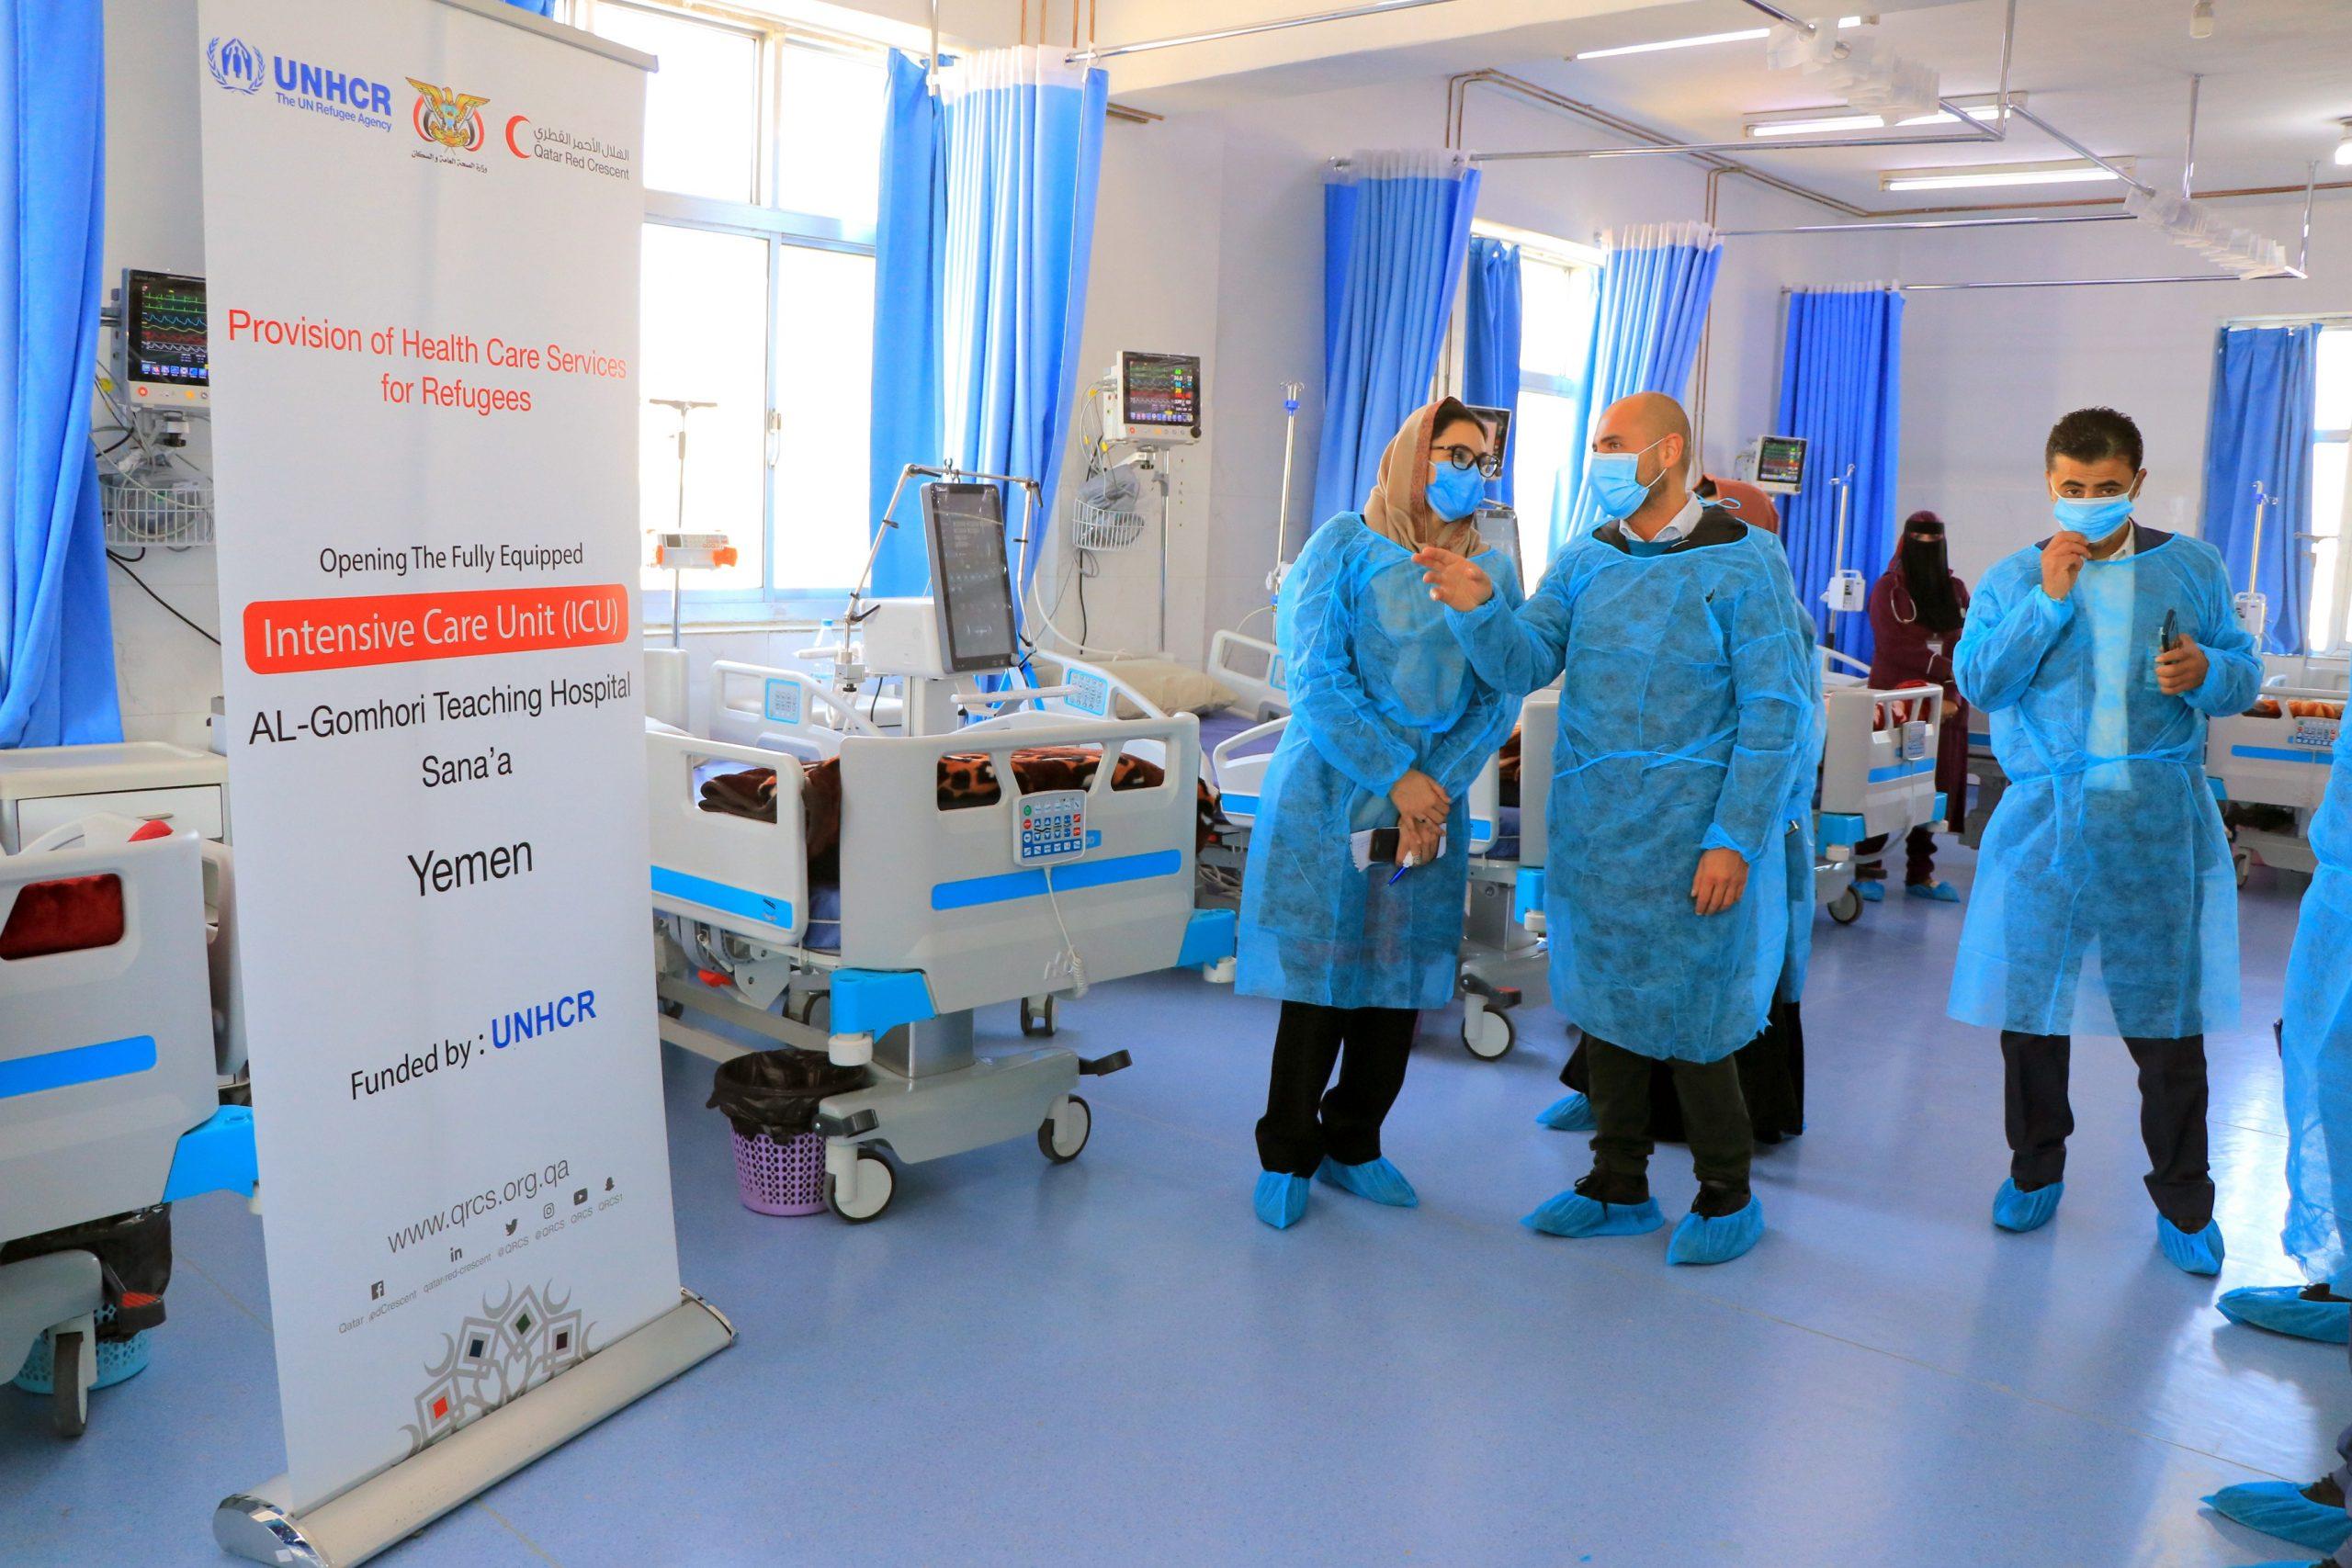 QRCS Opens EICS Department at Al-Jomhouri Hospital in Yemen